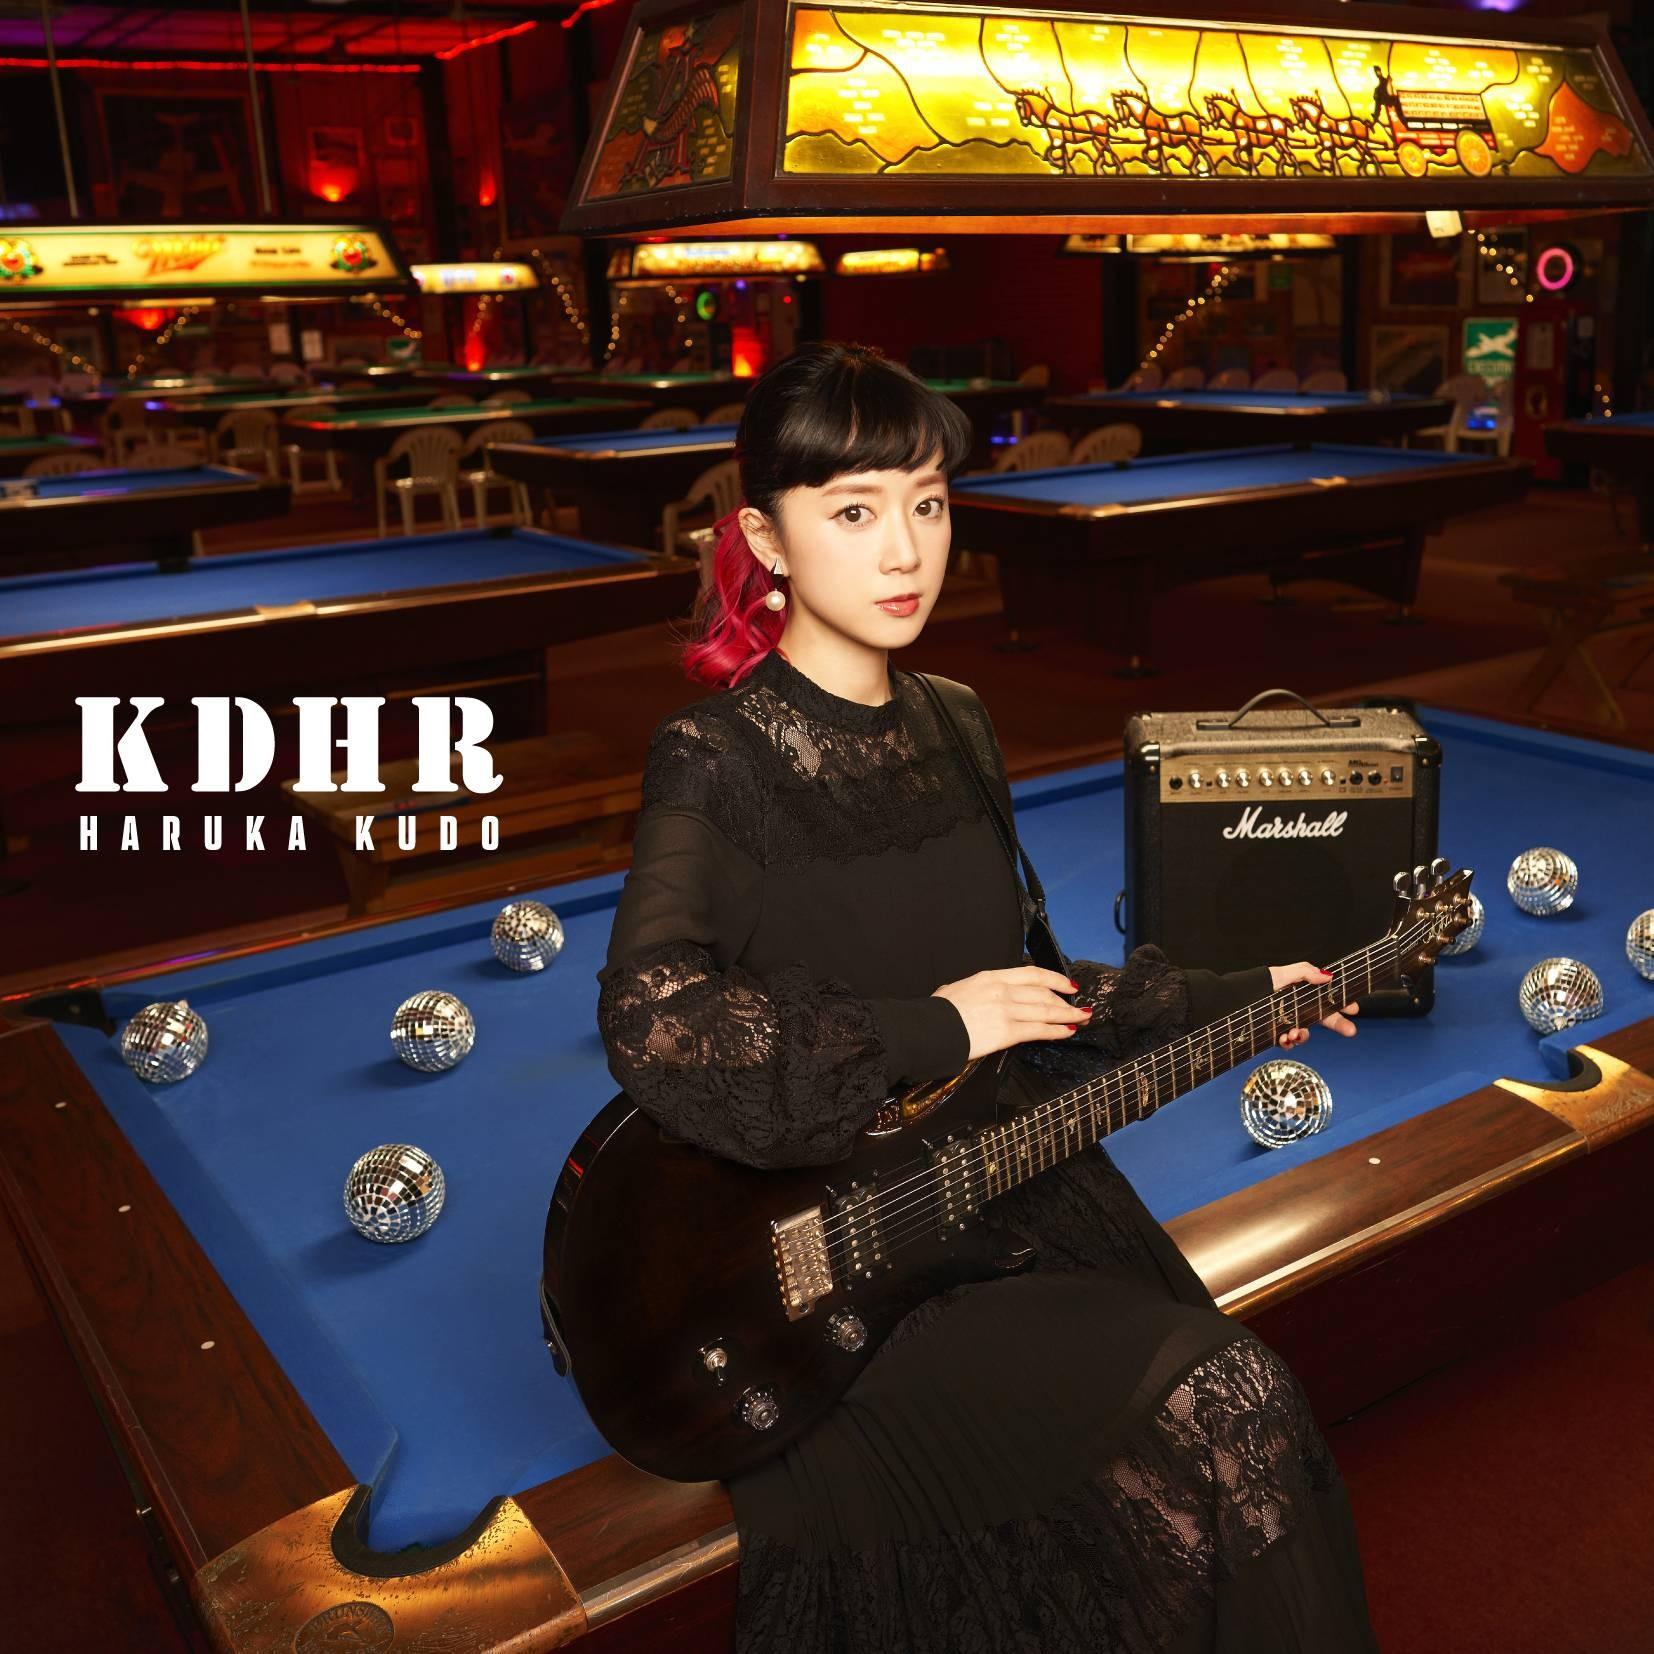 工藤晴香 (Haruka Kudo) – KDHR [Ototoy FLAC 24bit/48kHz]